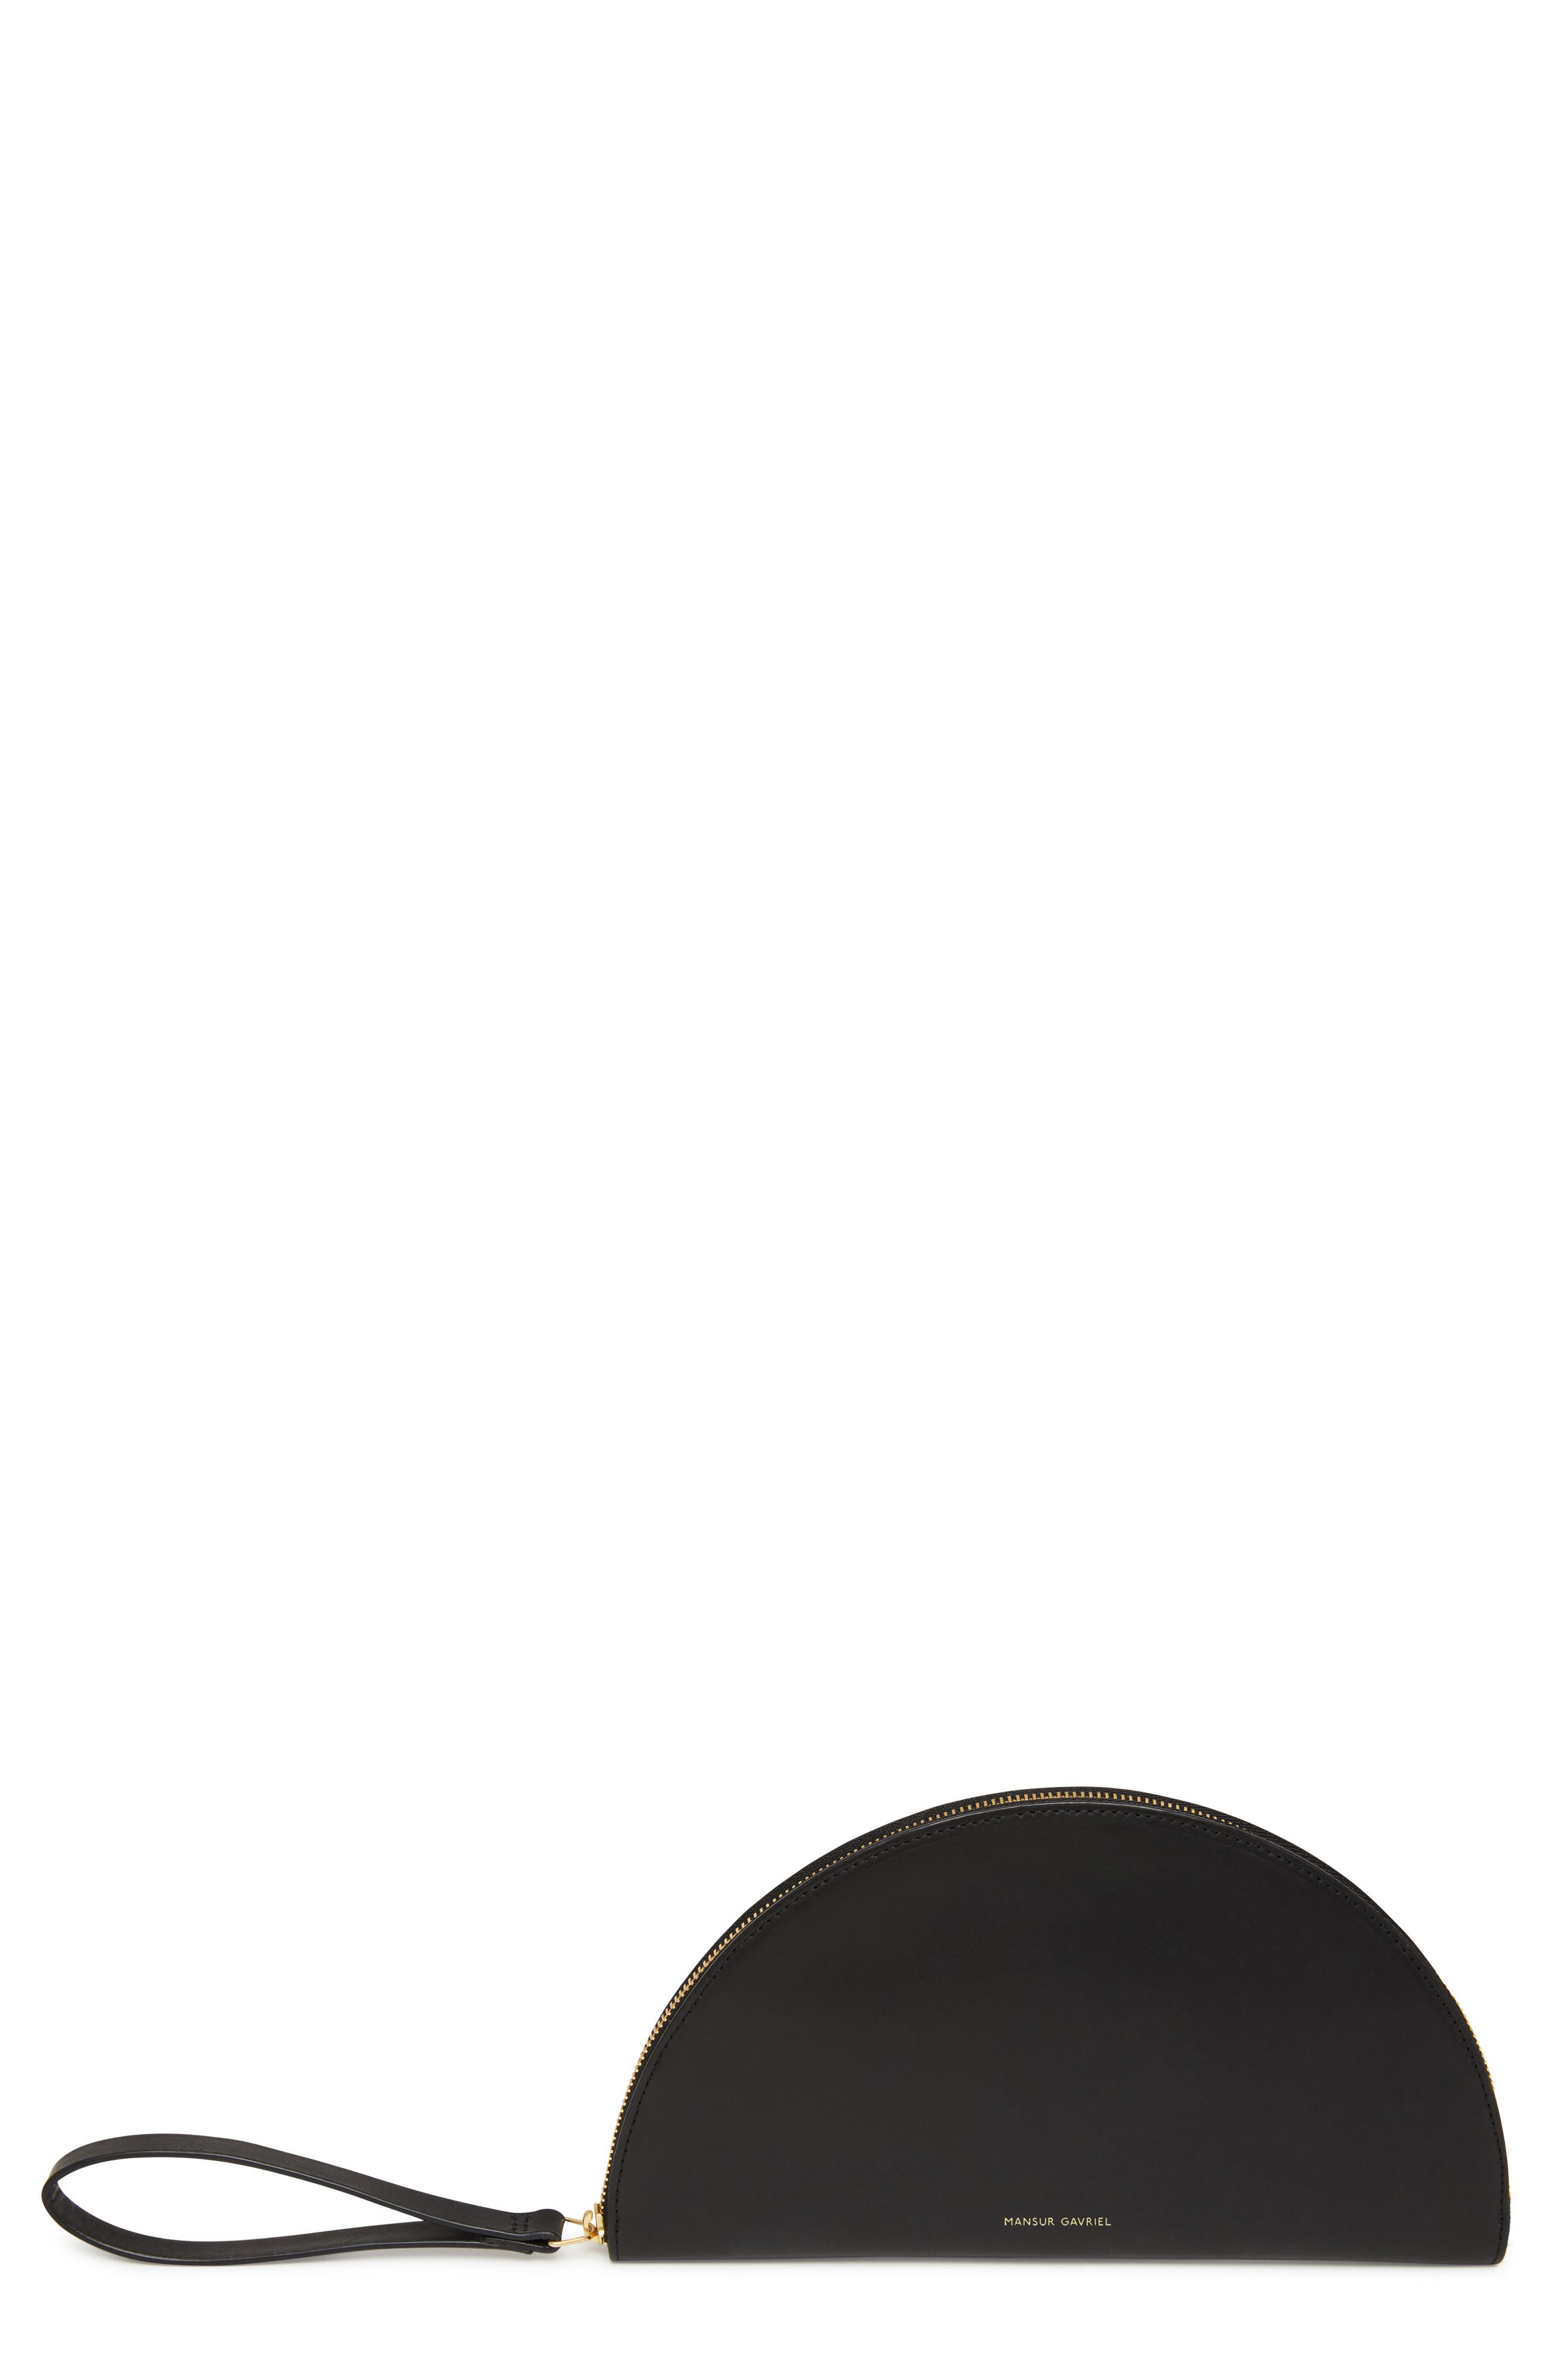 Moon Leather Wallet,                         Main,                         color, BLACK/ FLAMMA